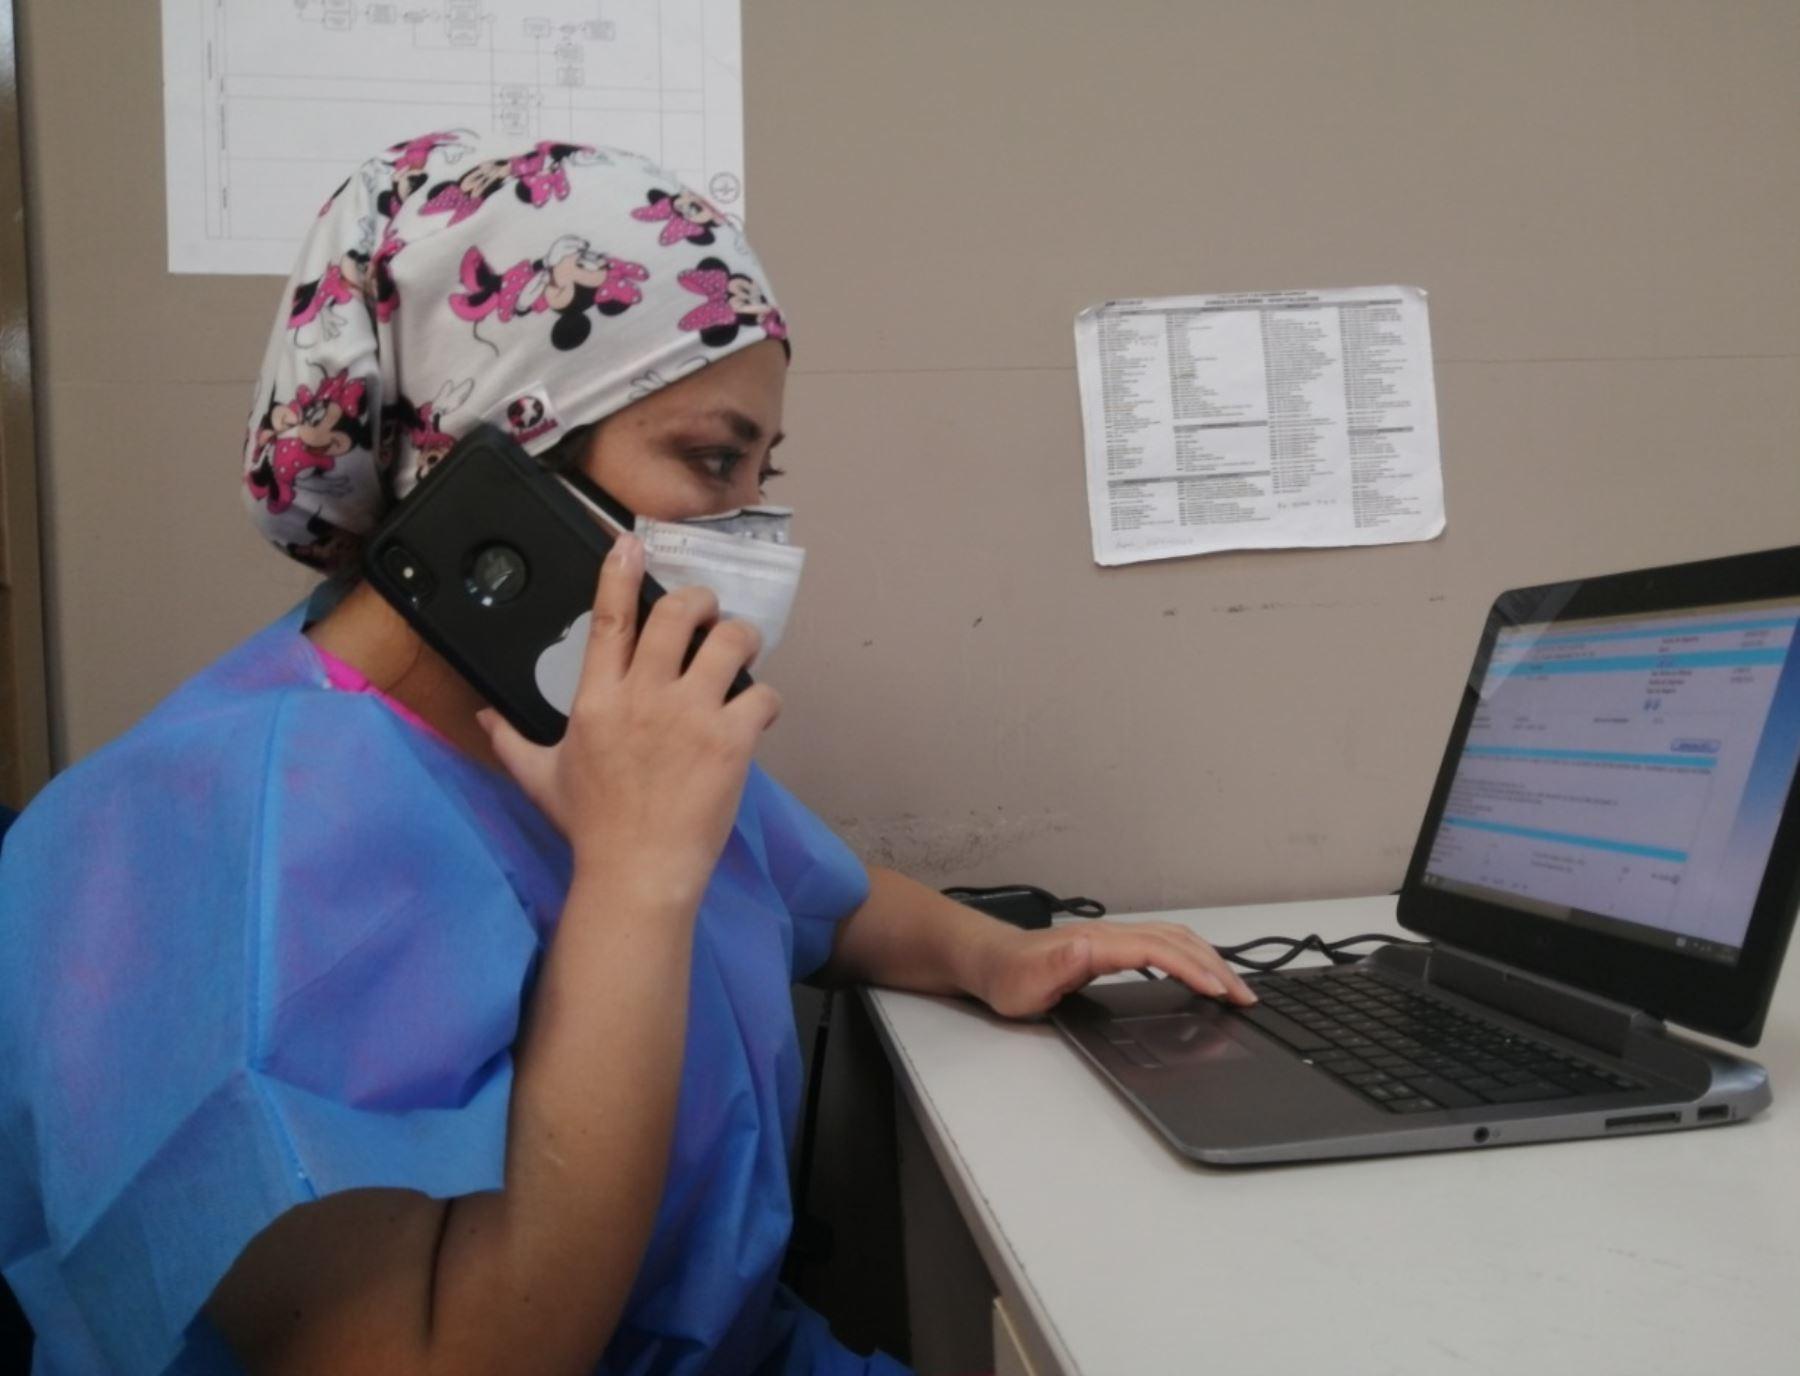 El hospital Alberto Sabogal Sologuren del Seguro Social de Salud (EsSalud) implementó el servicio de teleconsulta médica. Foto: Hospital Sabogal